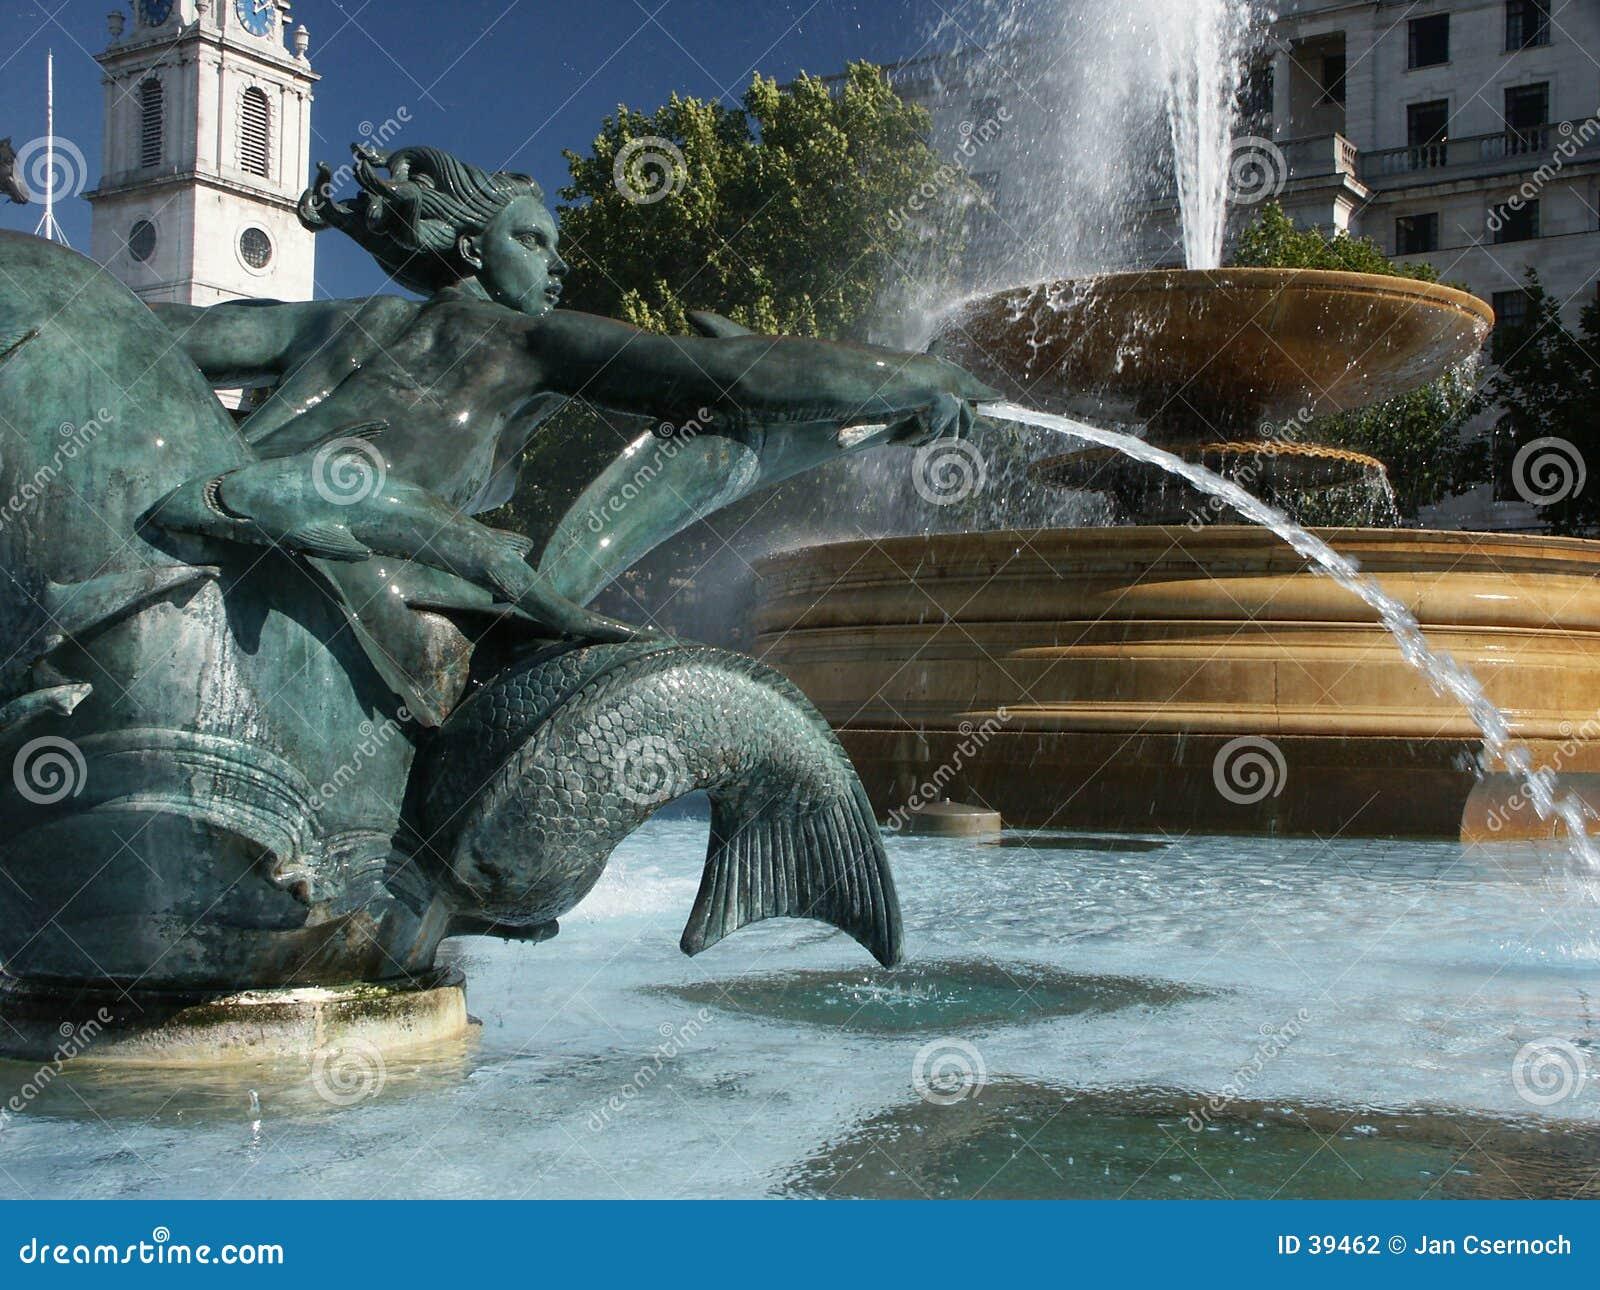 Bliżej trafalgar square, fontanna